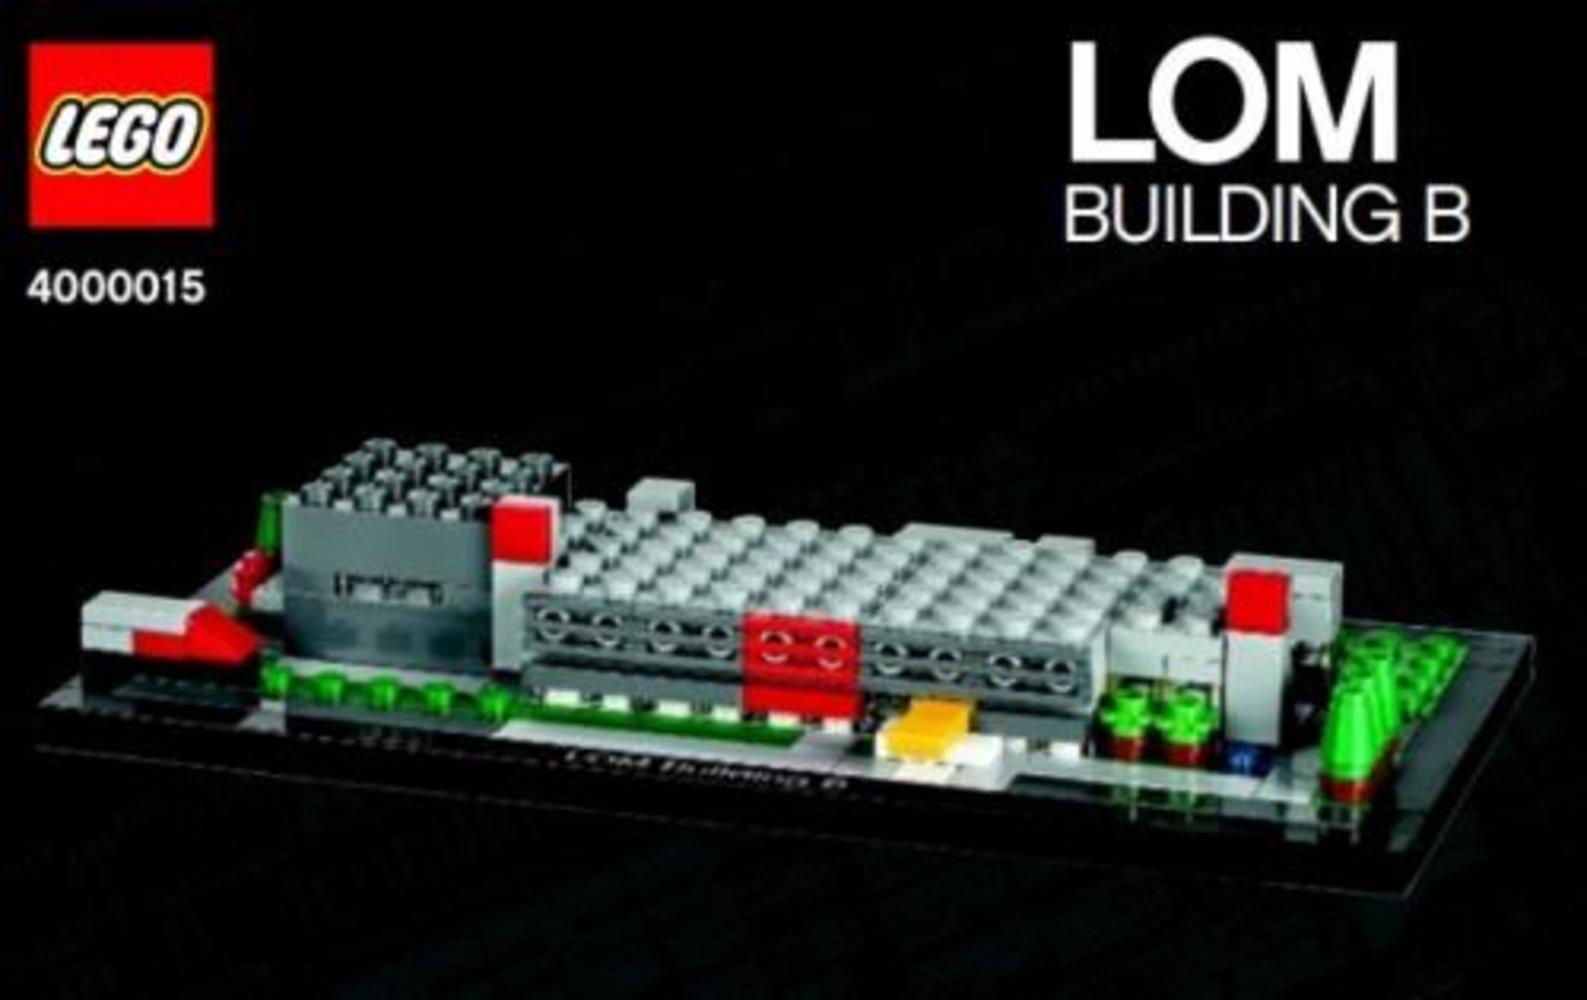 LOM Building B